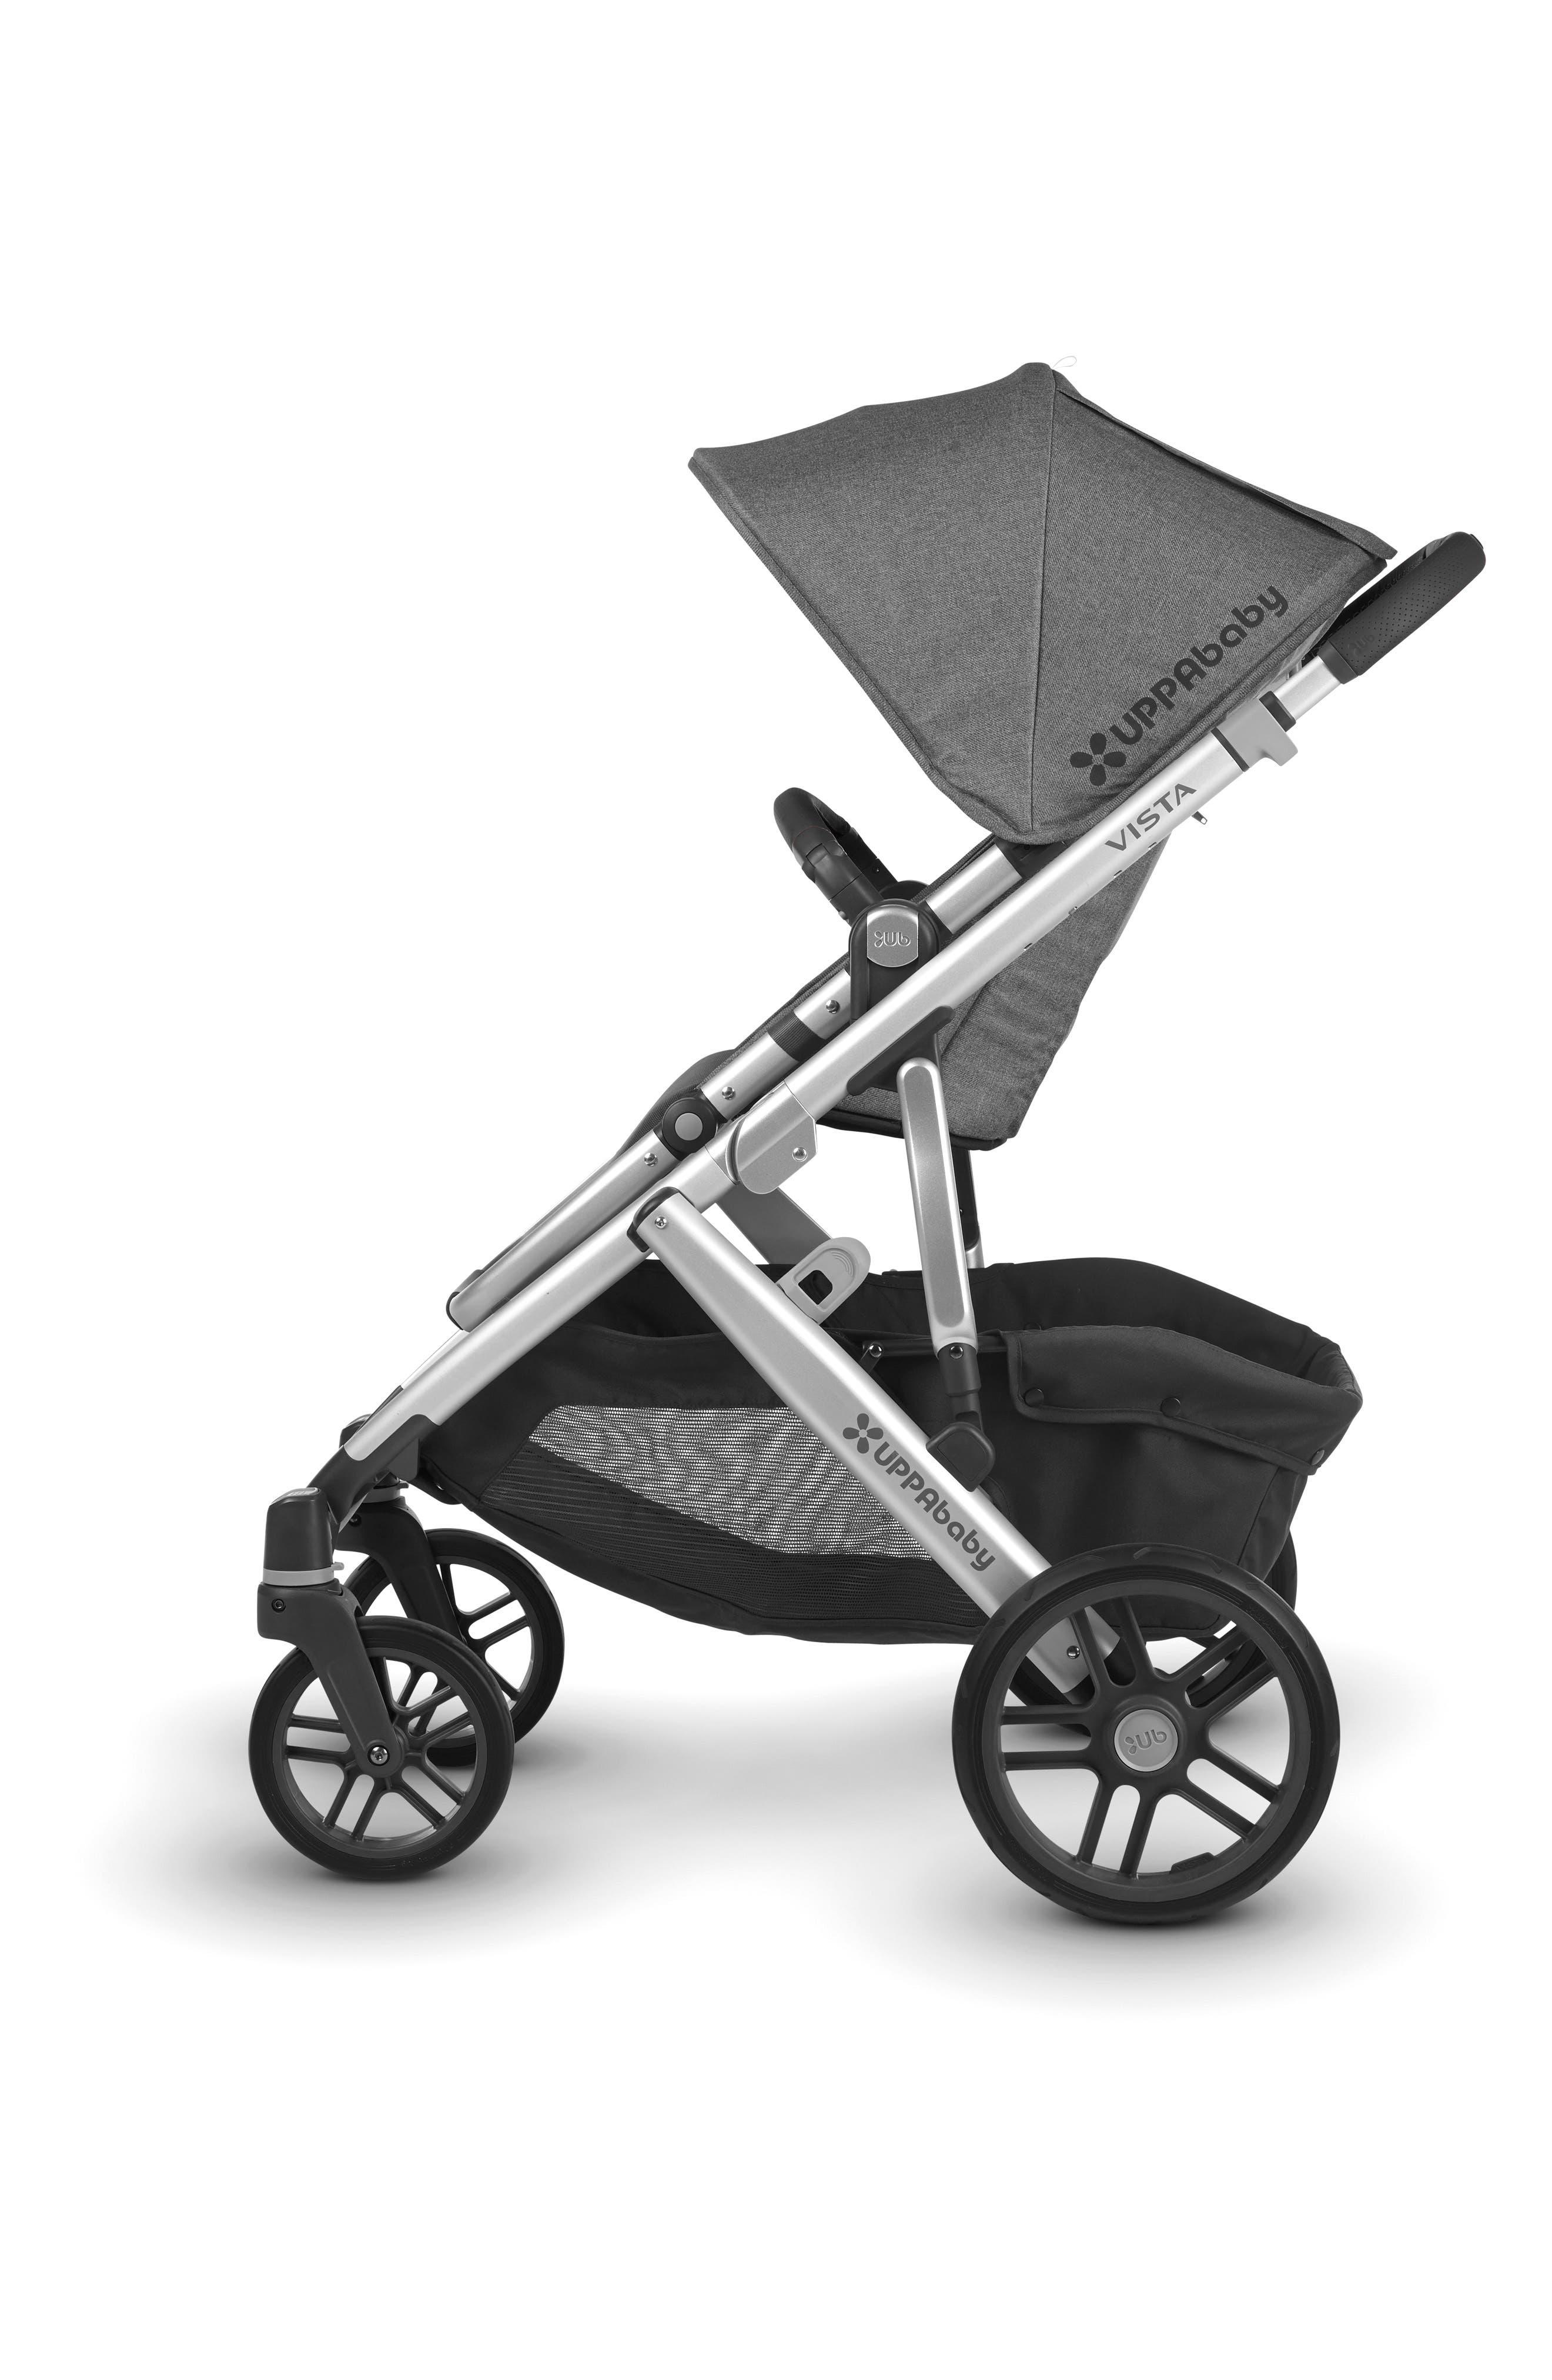 2018 VISTA Aluminum Frame Convertible Complete Stroller with Leather Trim,                             Alternate thumbnail 2, color,                             Jordan Charcoal/ Silver